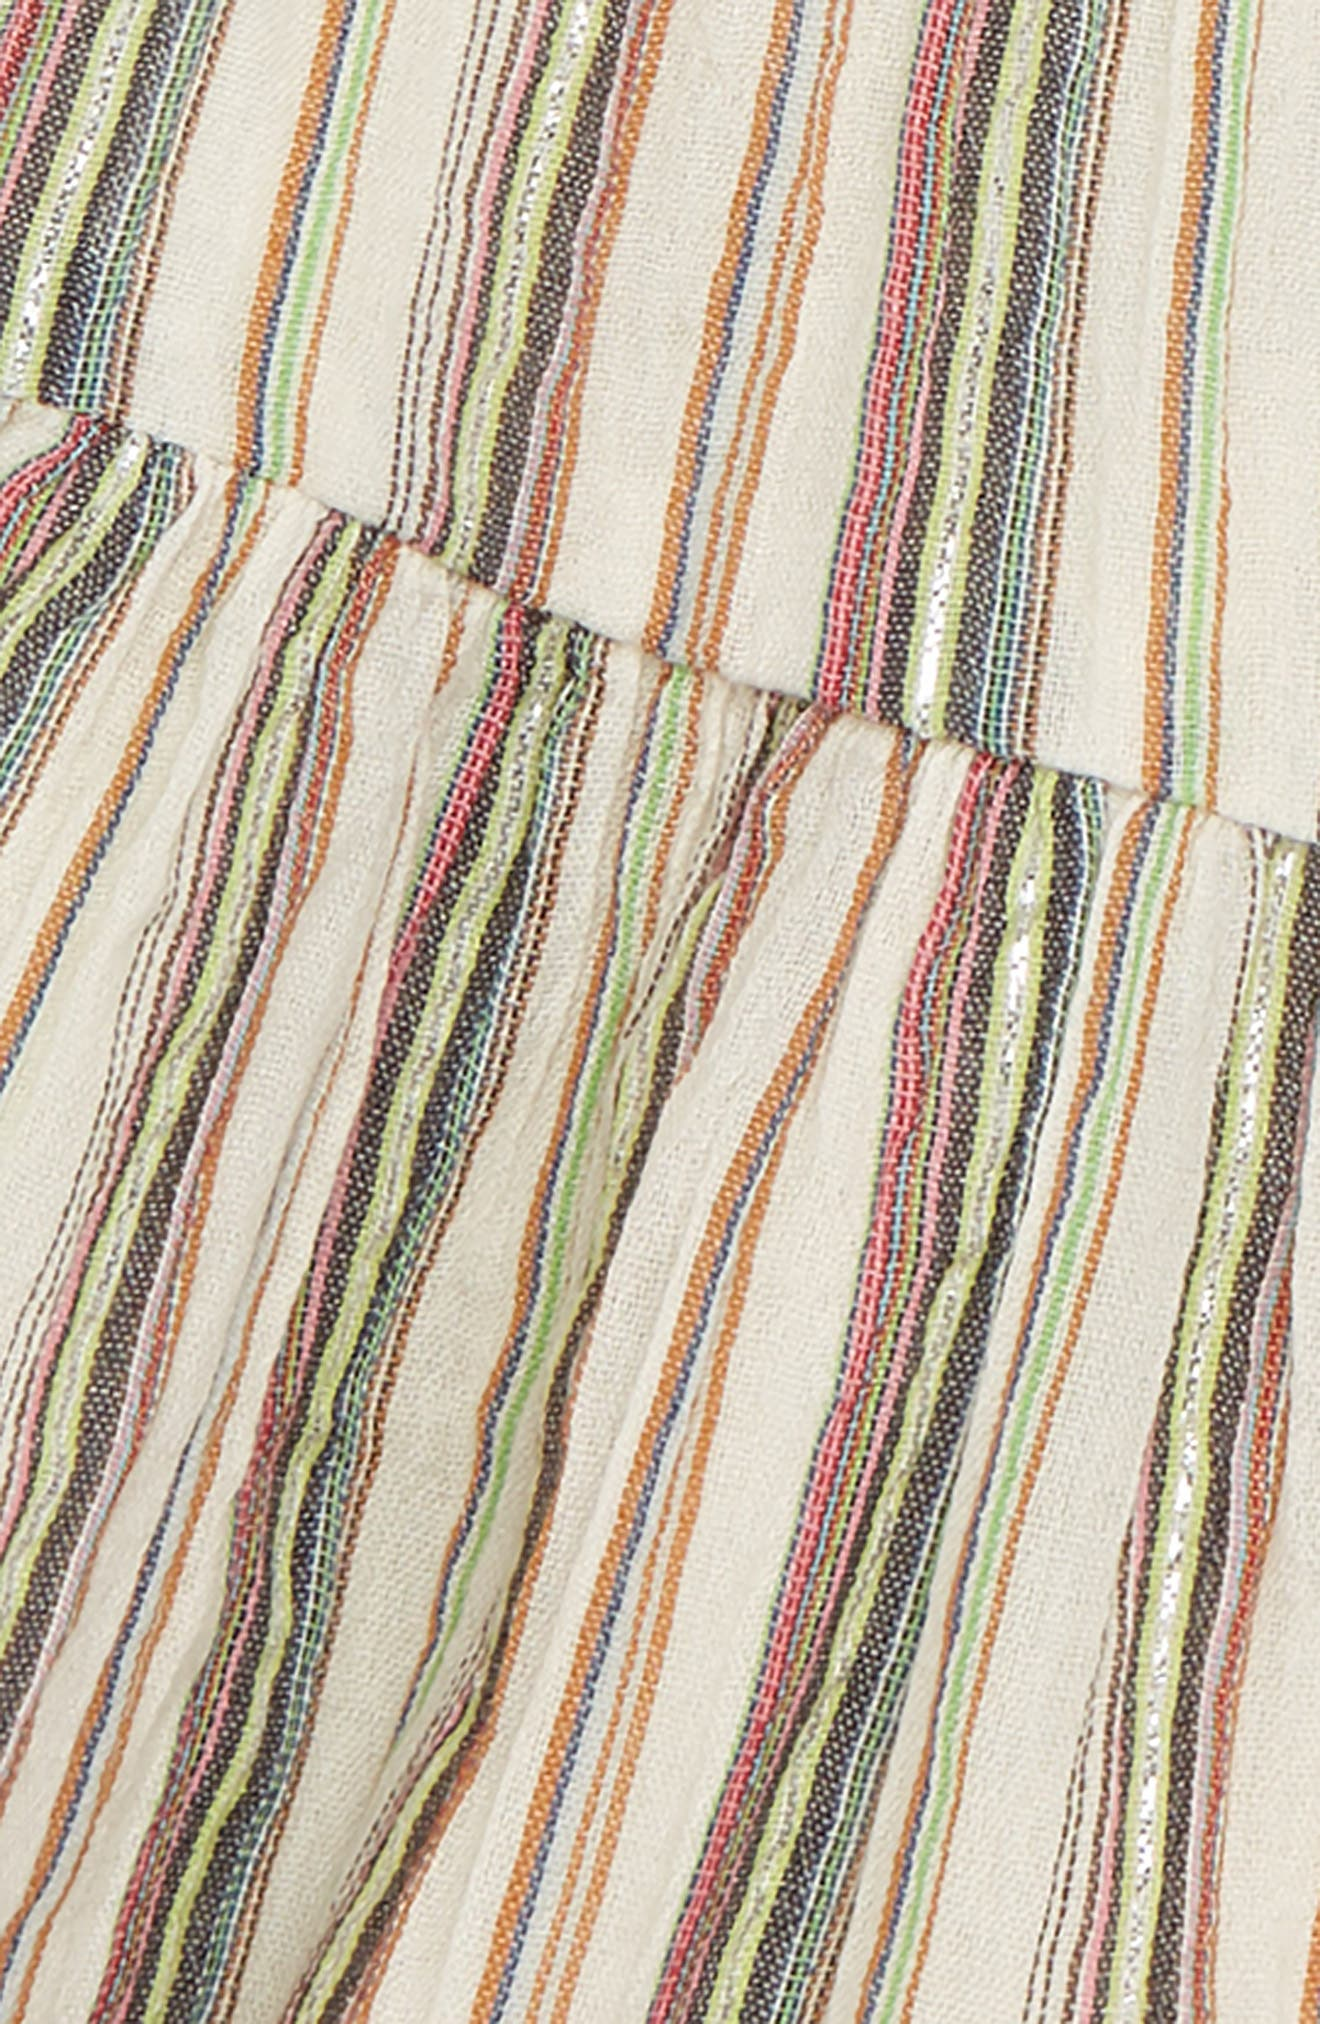 Nora Woven Shorts,                             Alternate thumbnail 2, color,                             Ivory